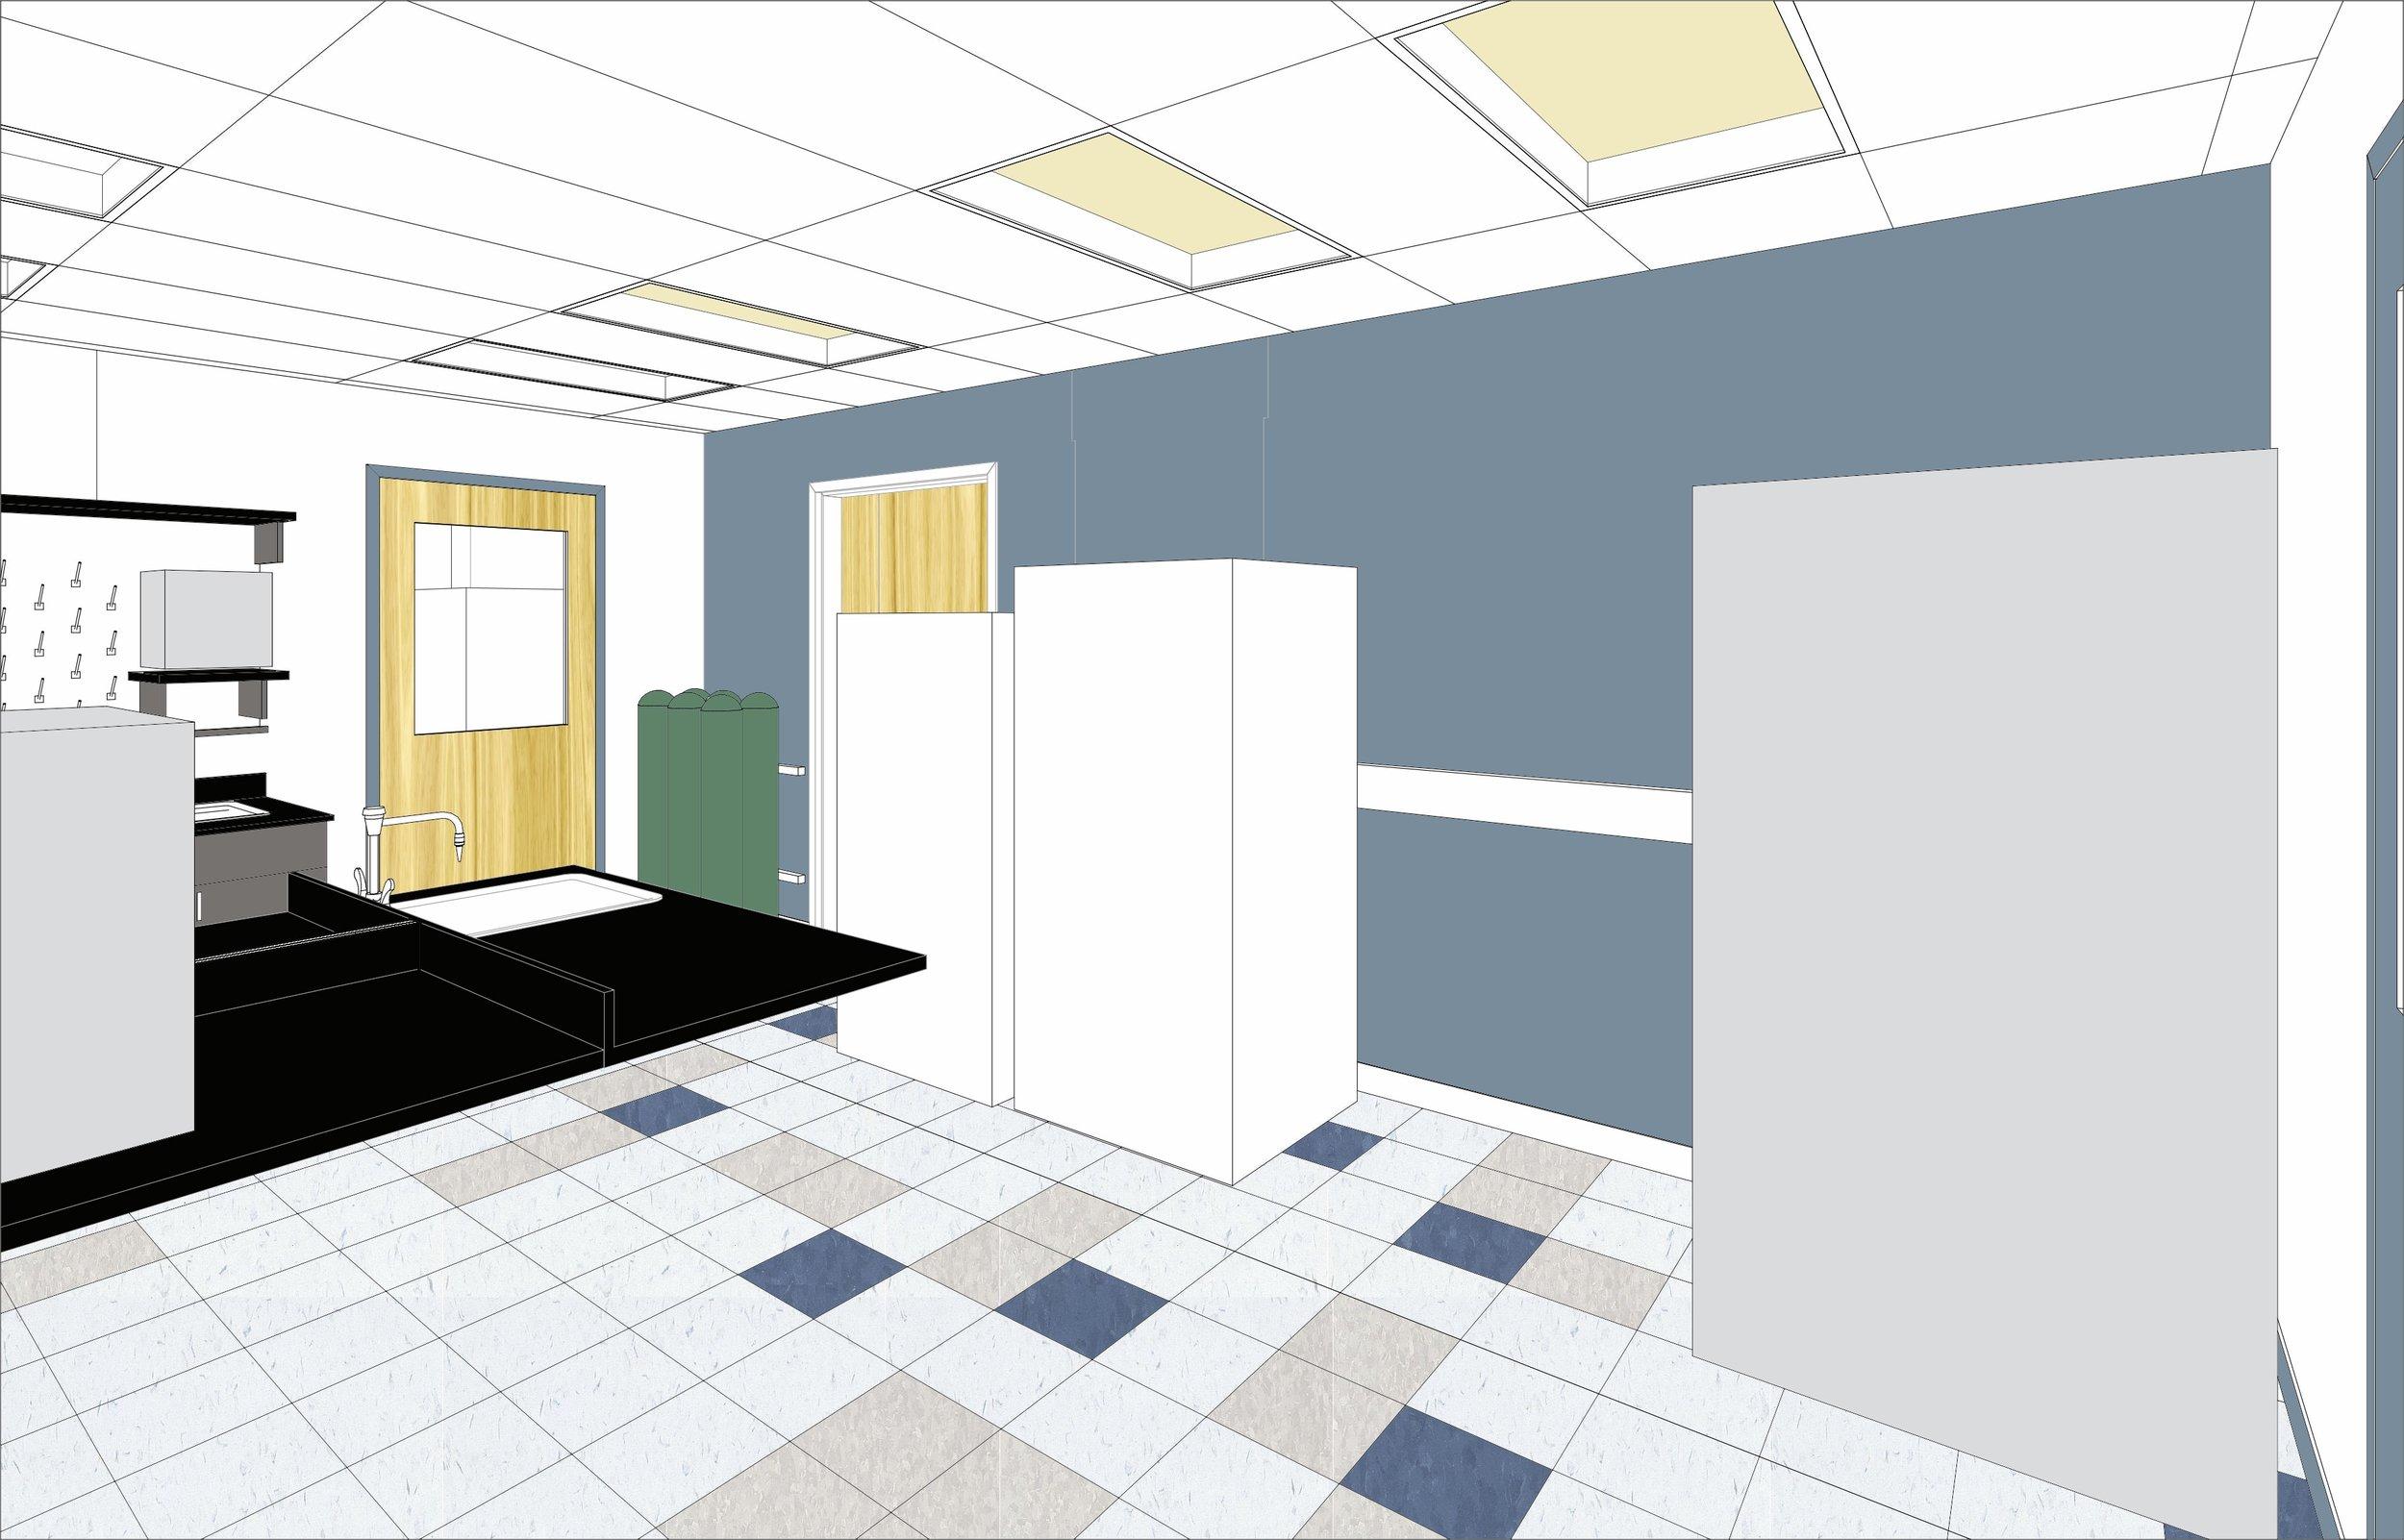 Laboratory 3310 2_BW.jpg